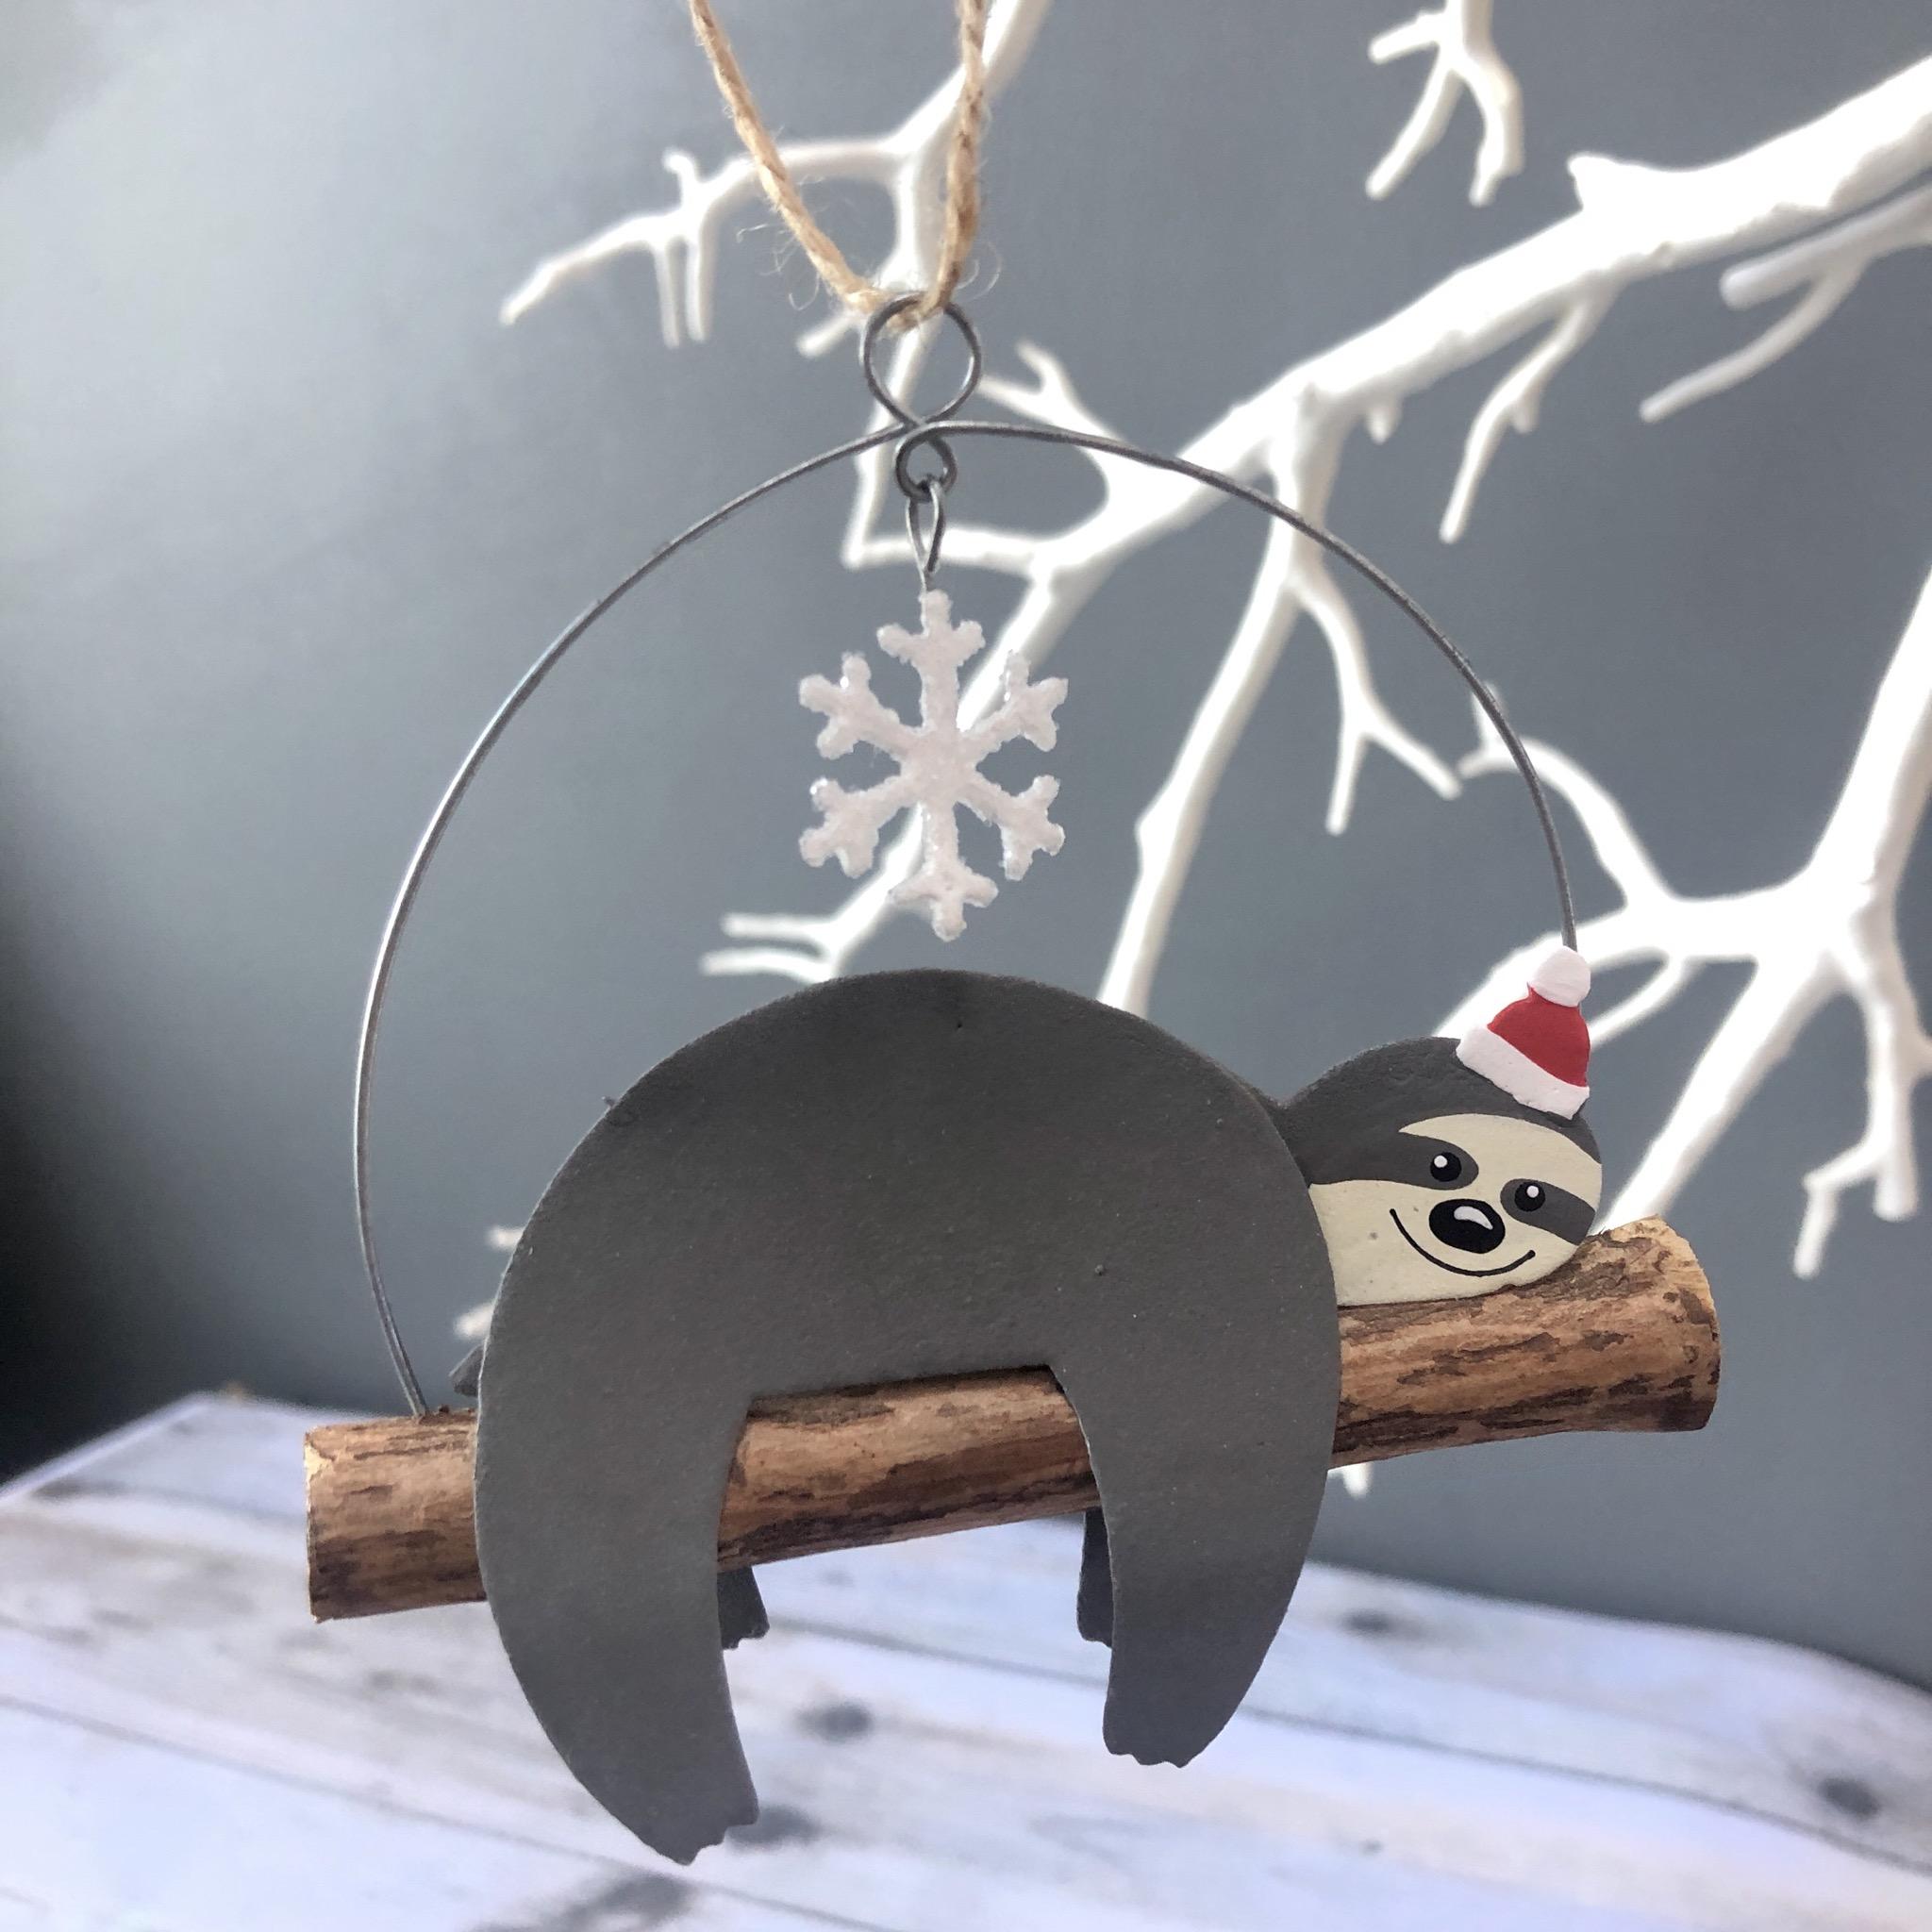 Christmas sloth  tree decorating by shoeless joe